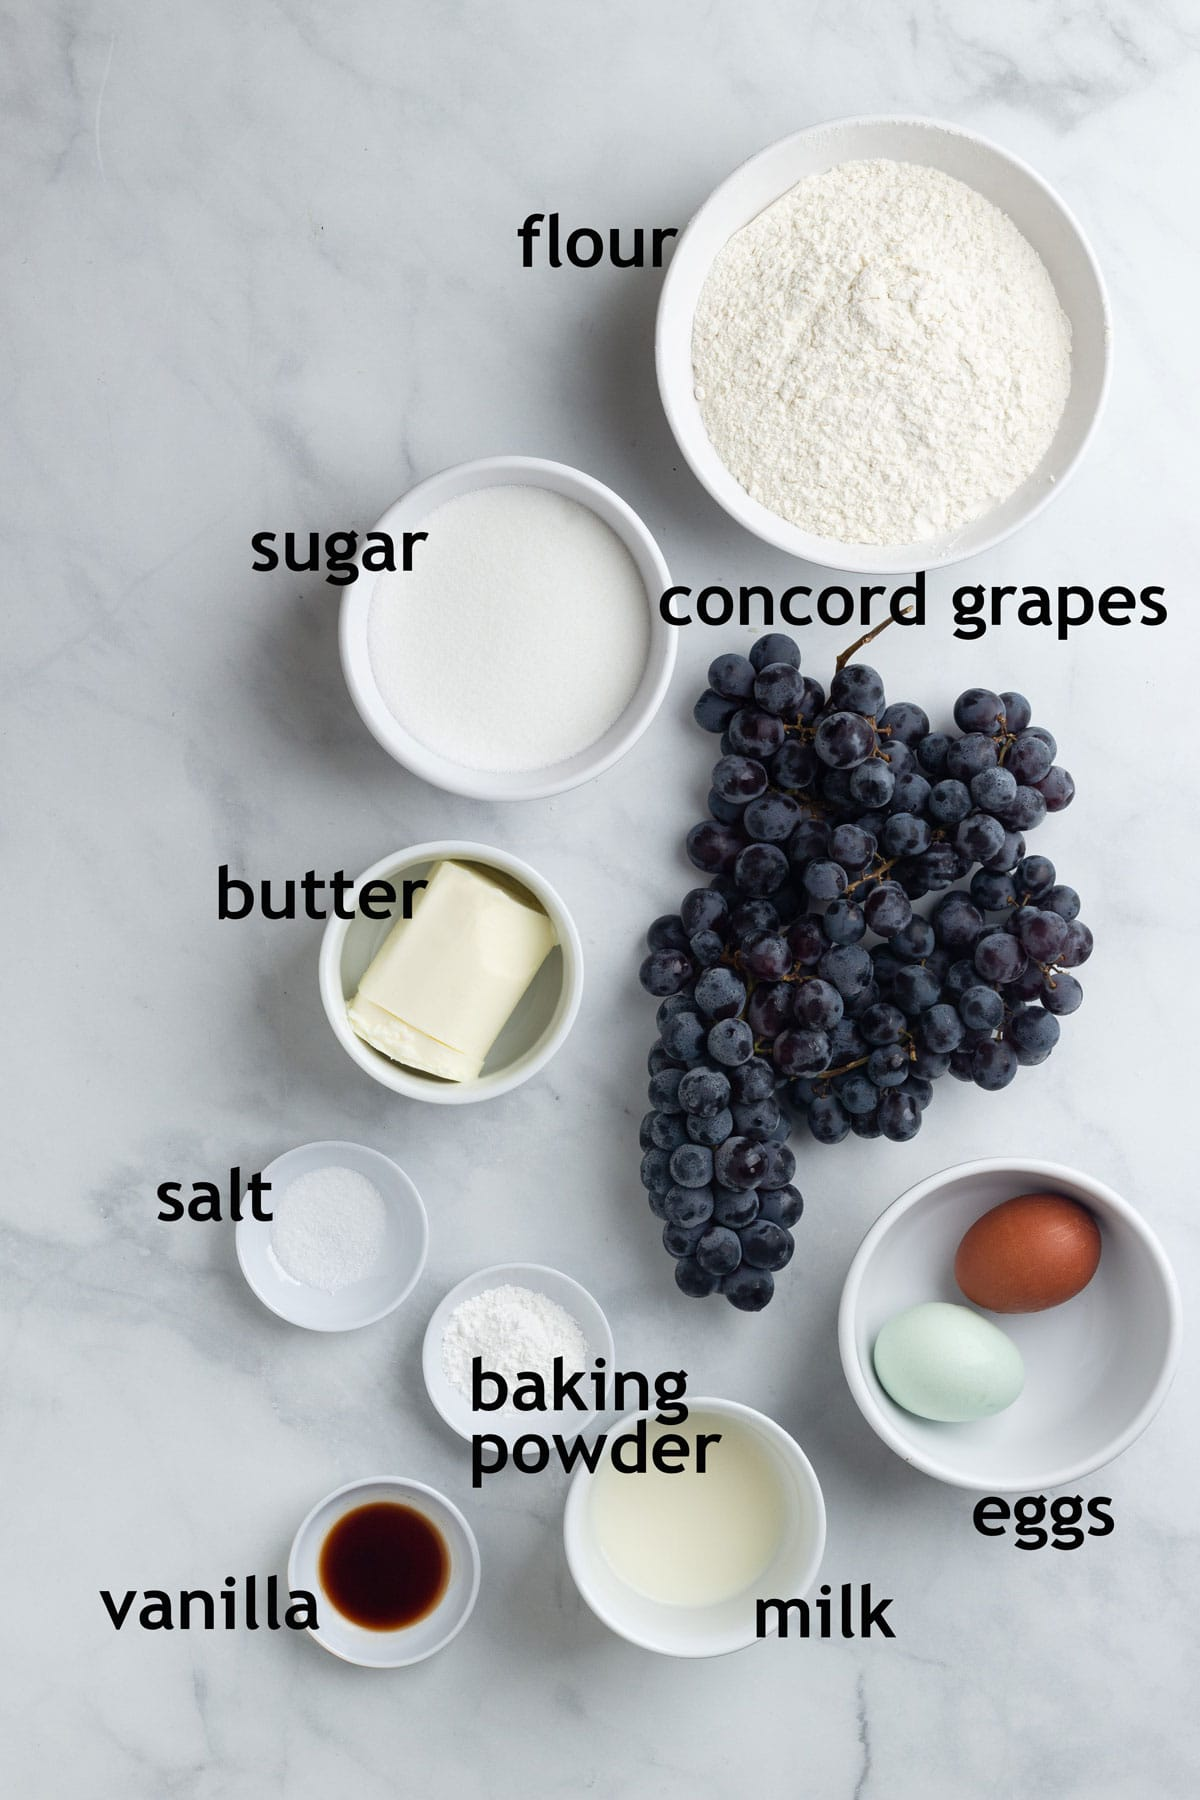 Ingredients including flour, sugar, butter, grapes, baking powder, salt, eggs, milk and vanilla.